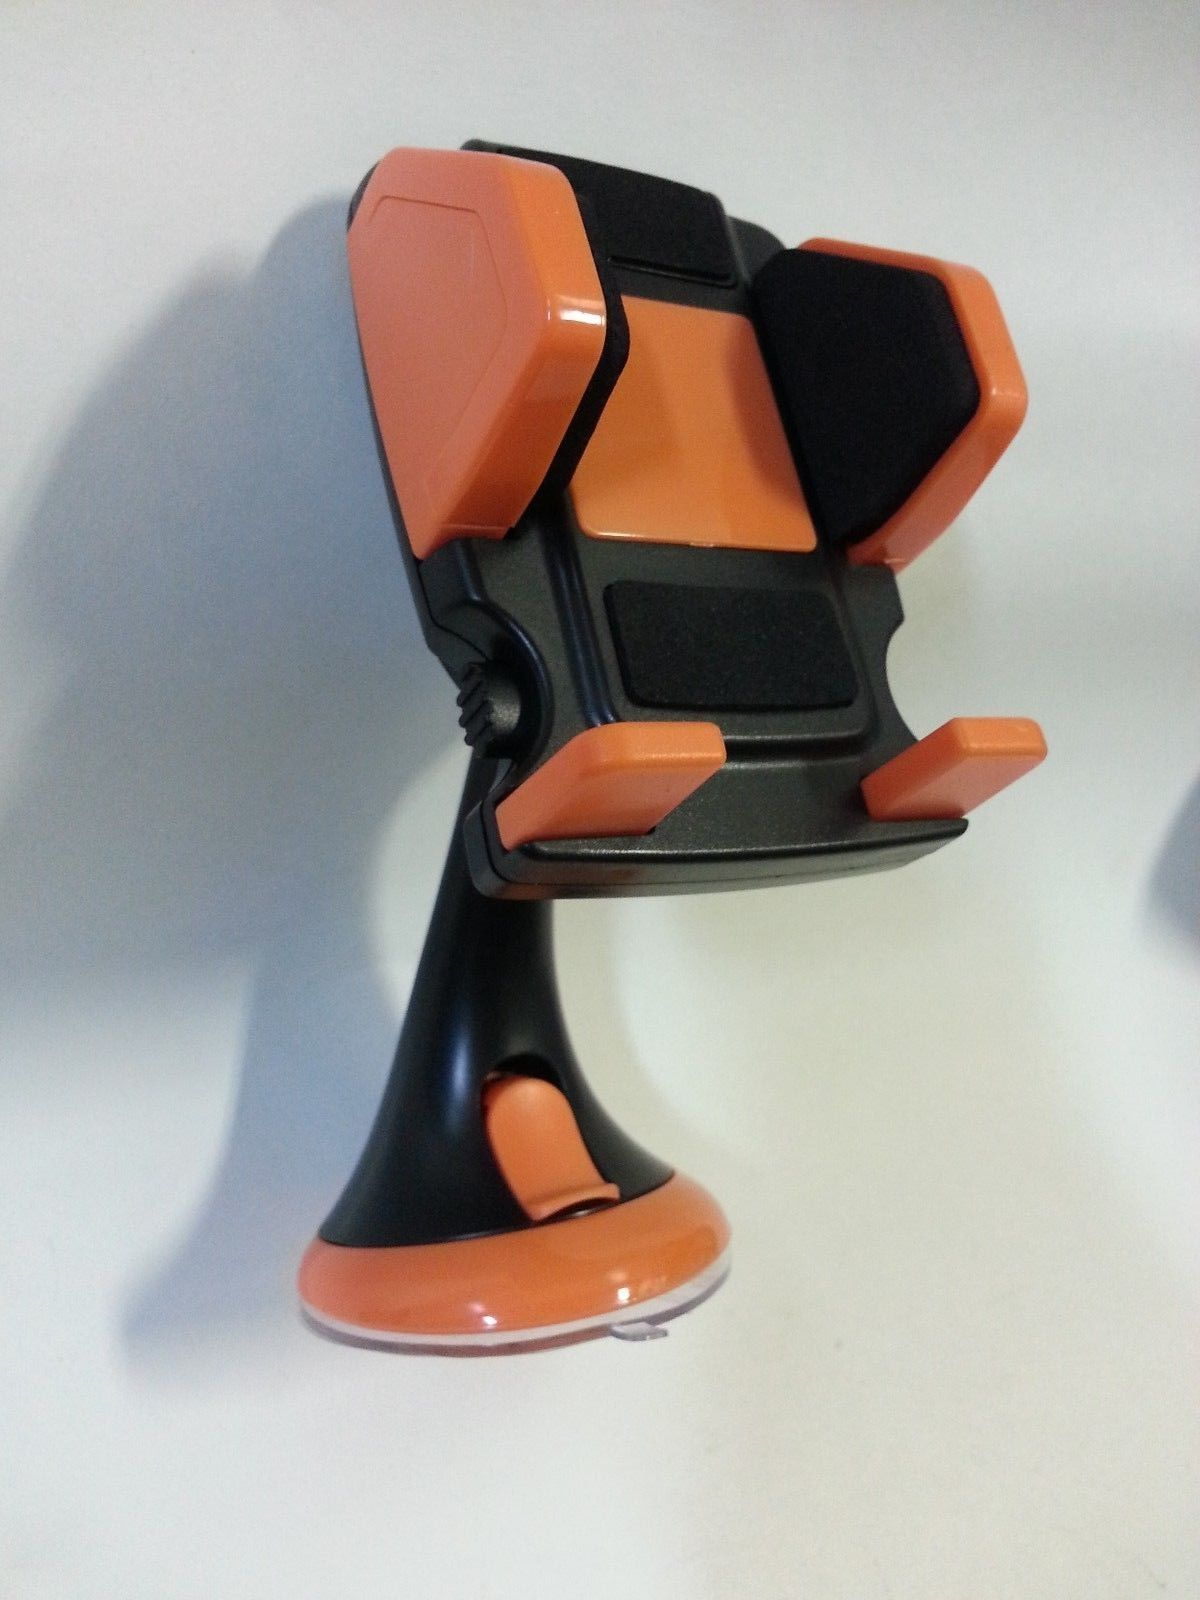 iMOUNT Universal Car Mount (Orange)